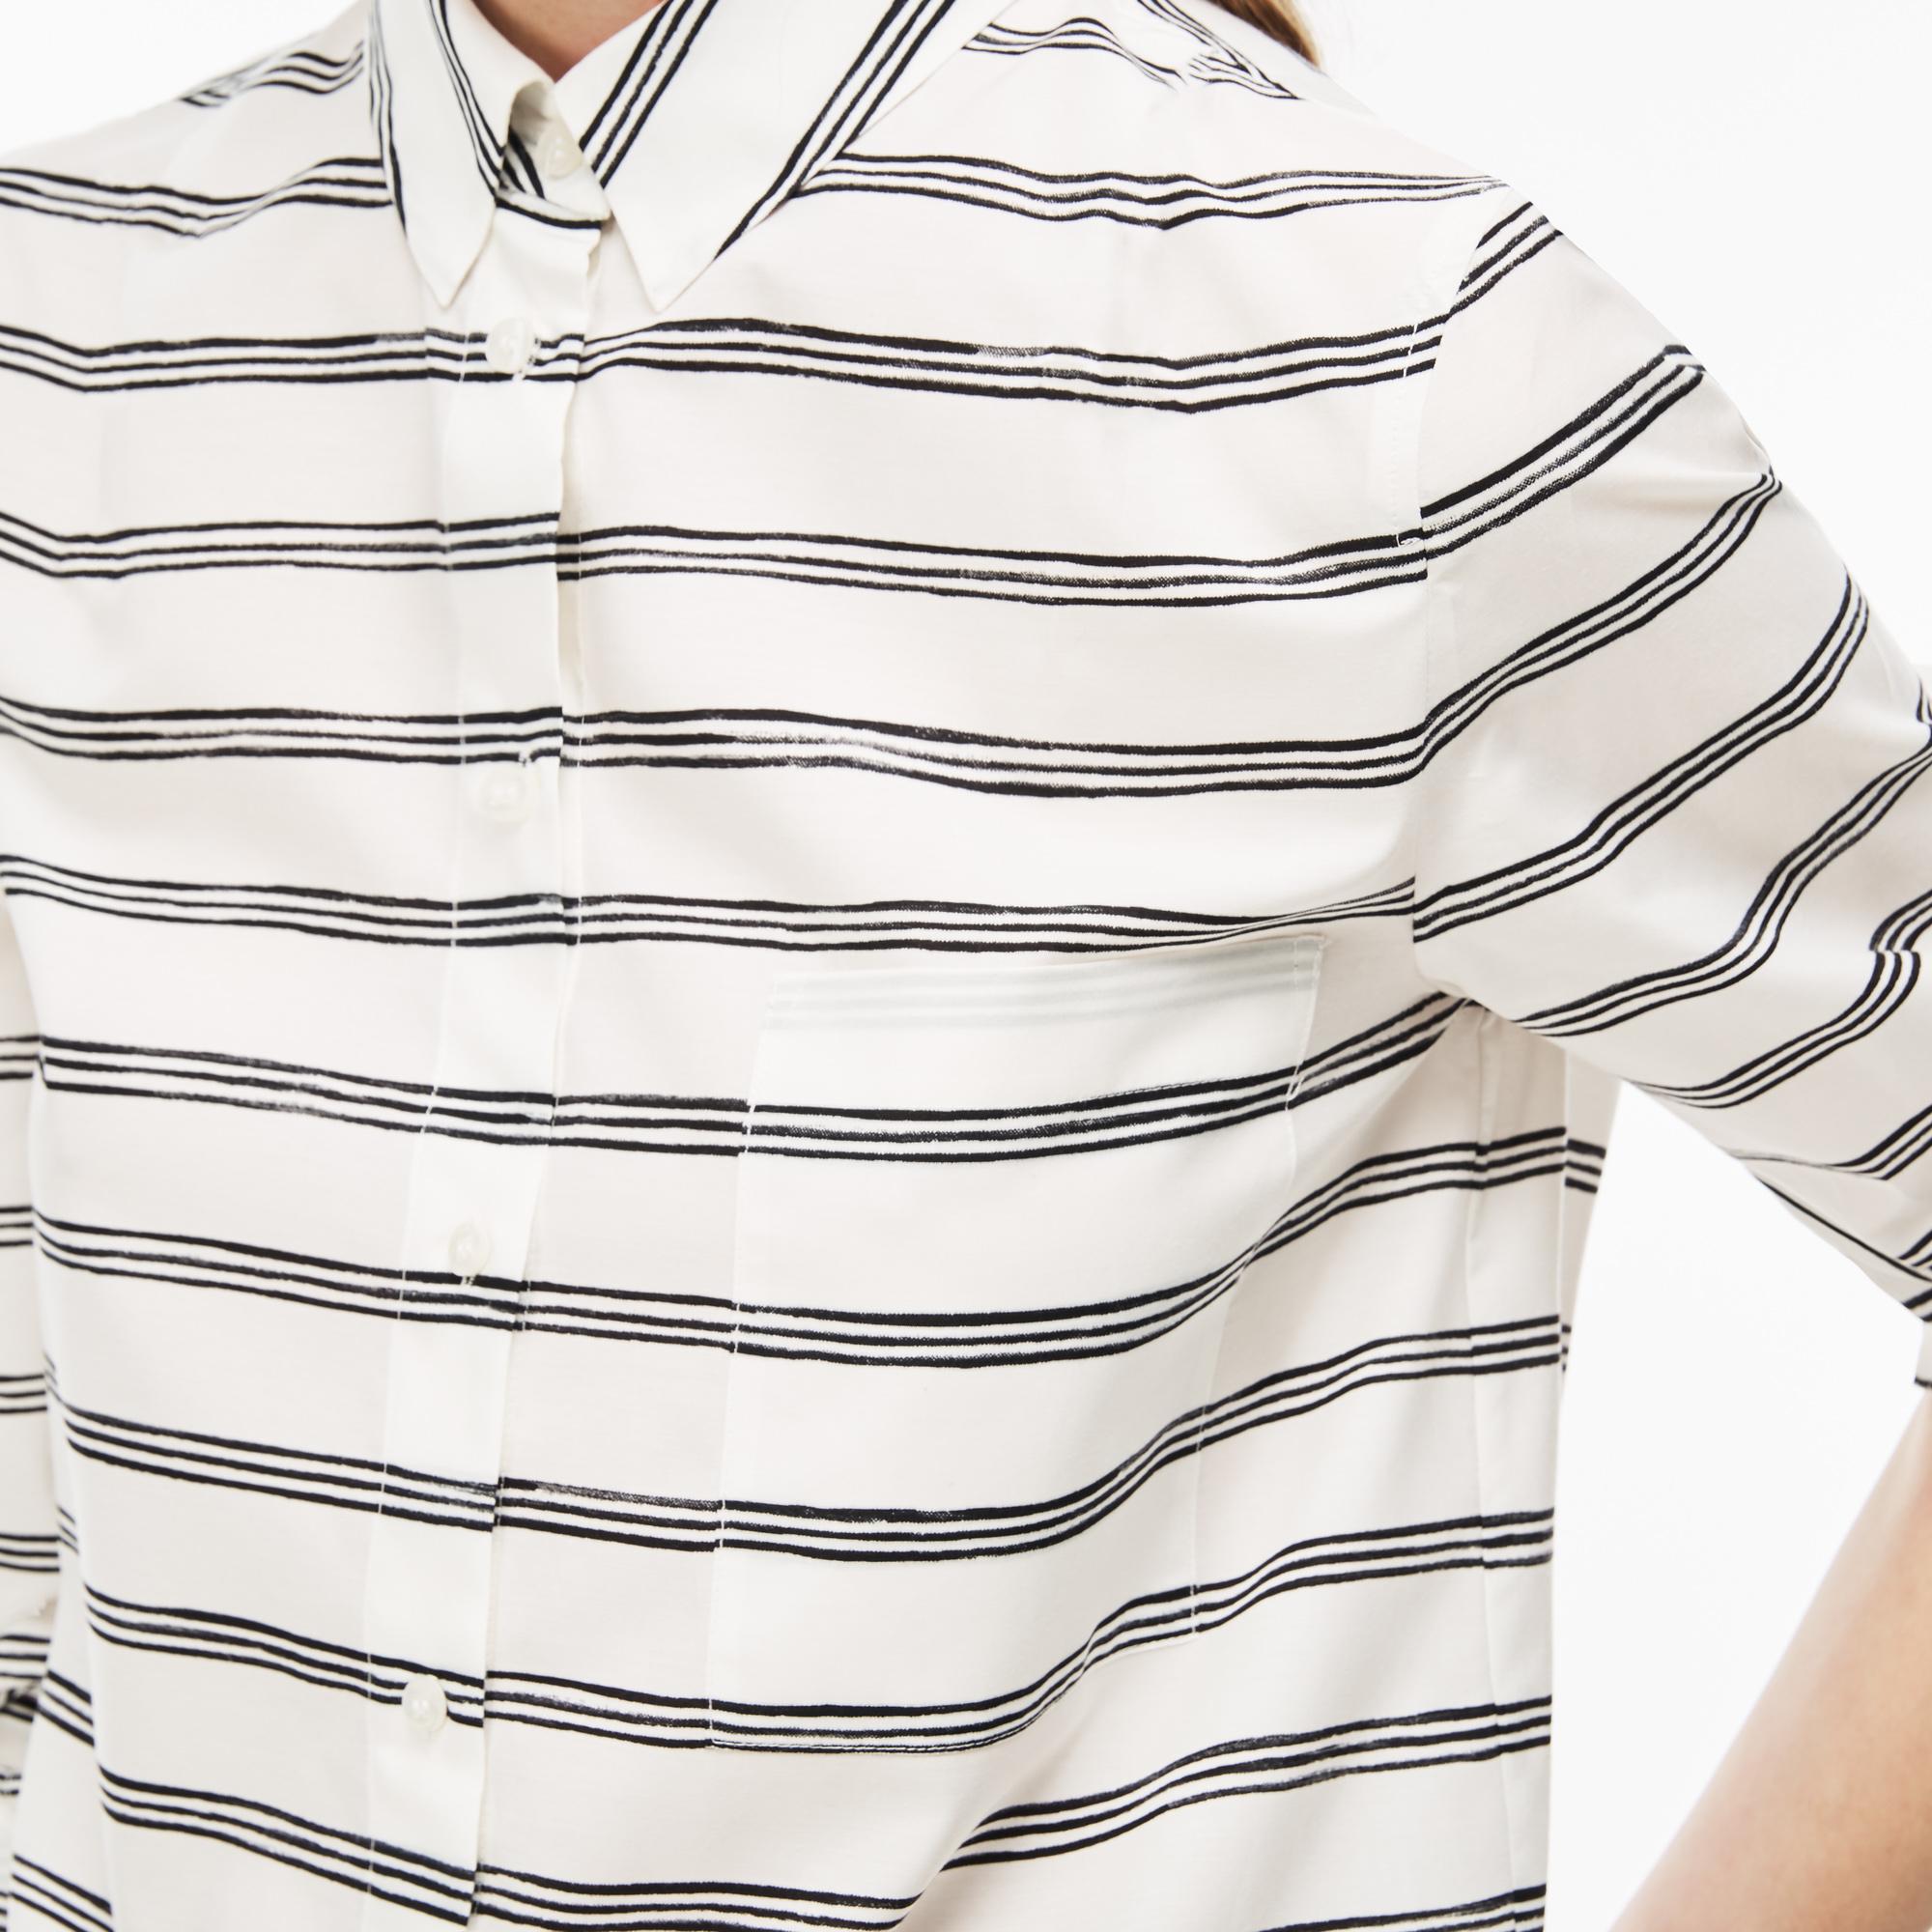 Фото 5 - Рубашку Lacoste Regular fit белого цвета